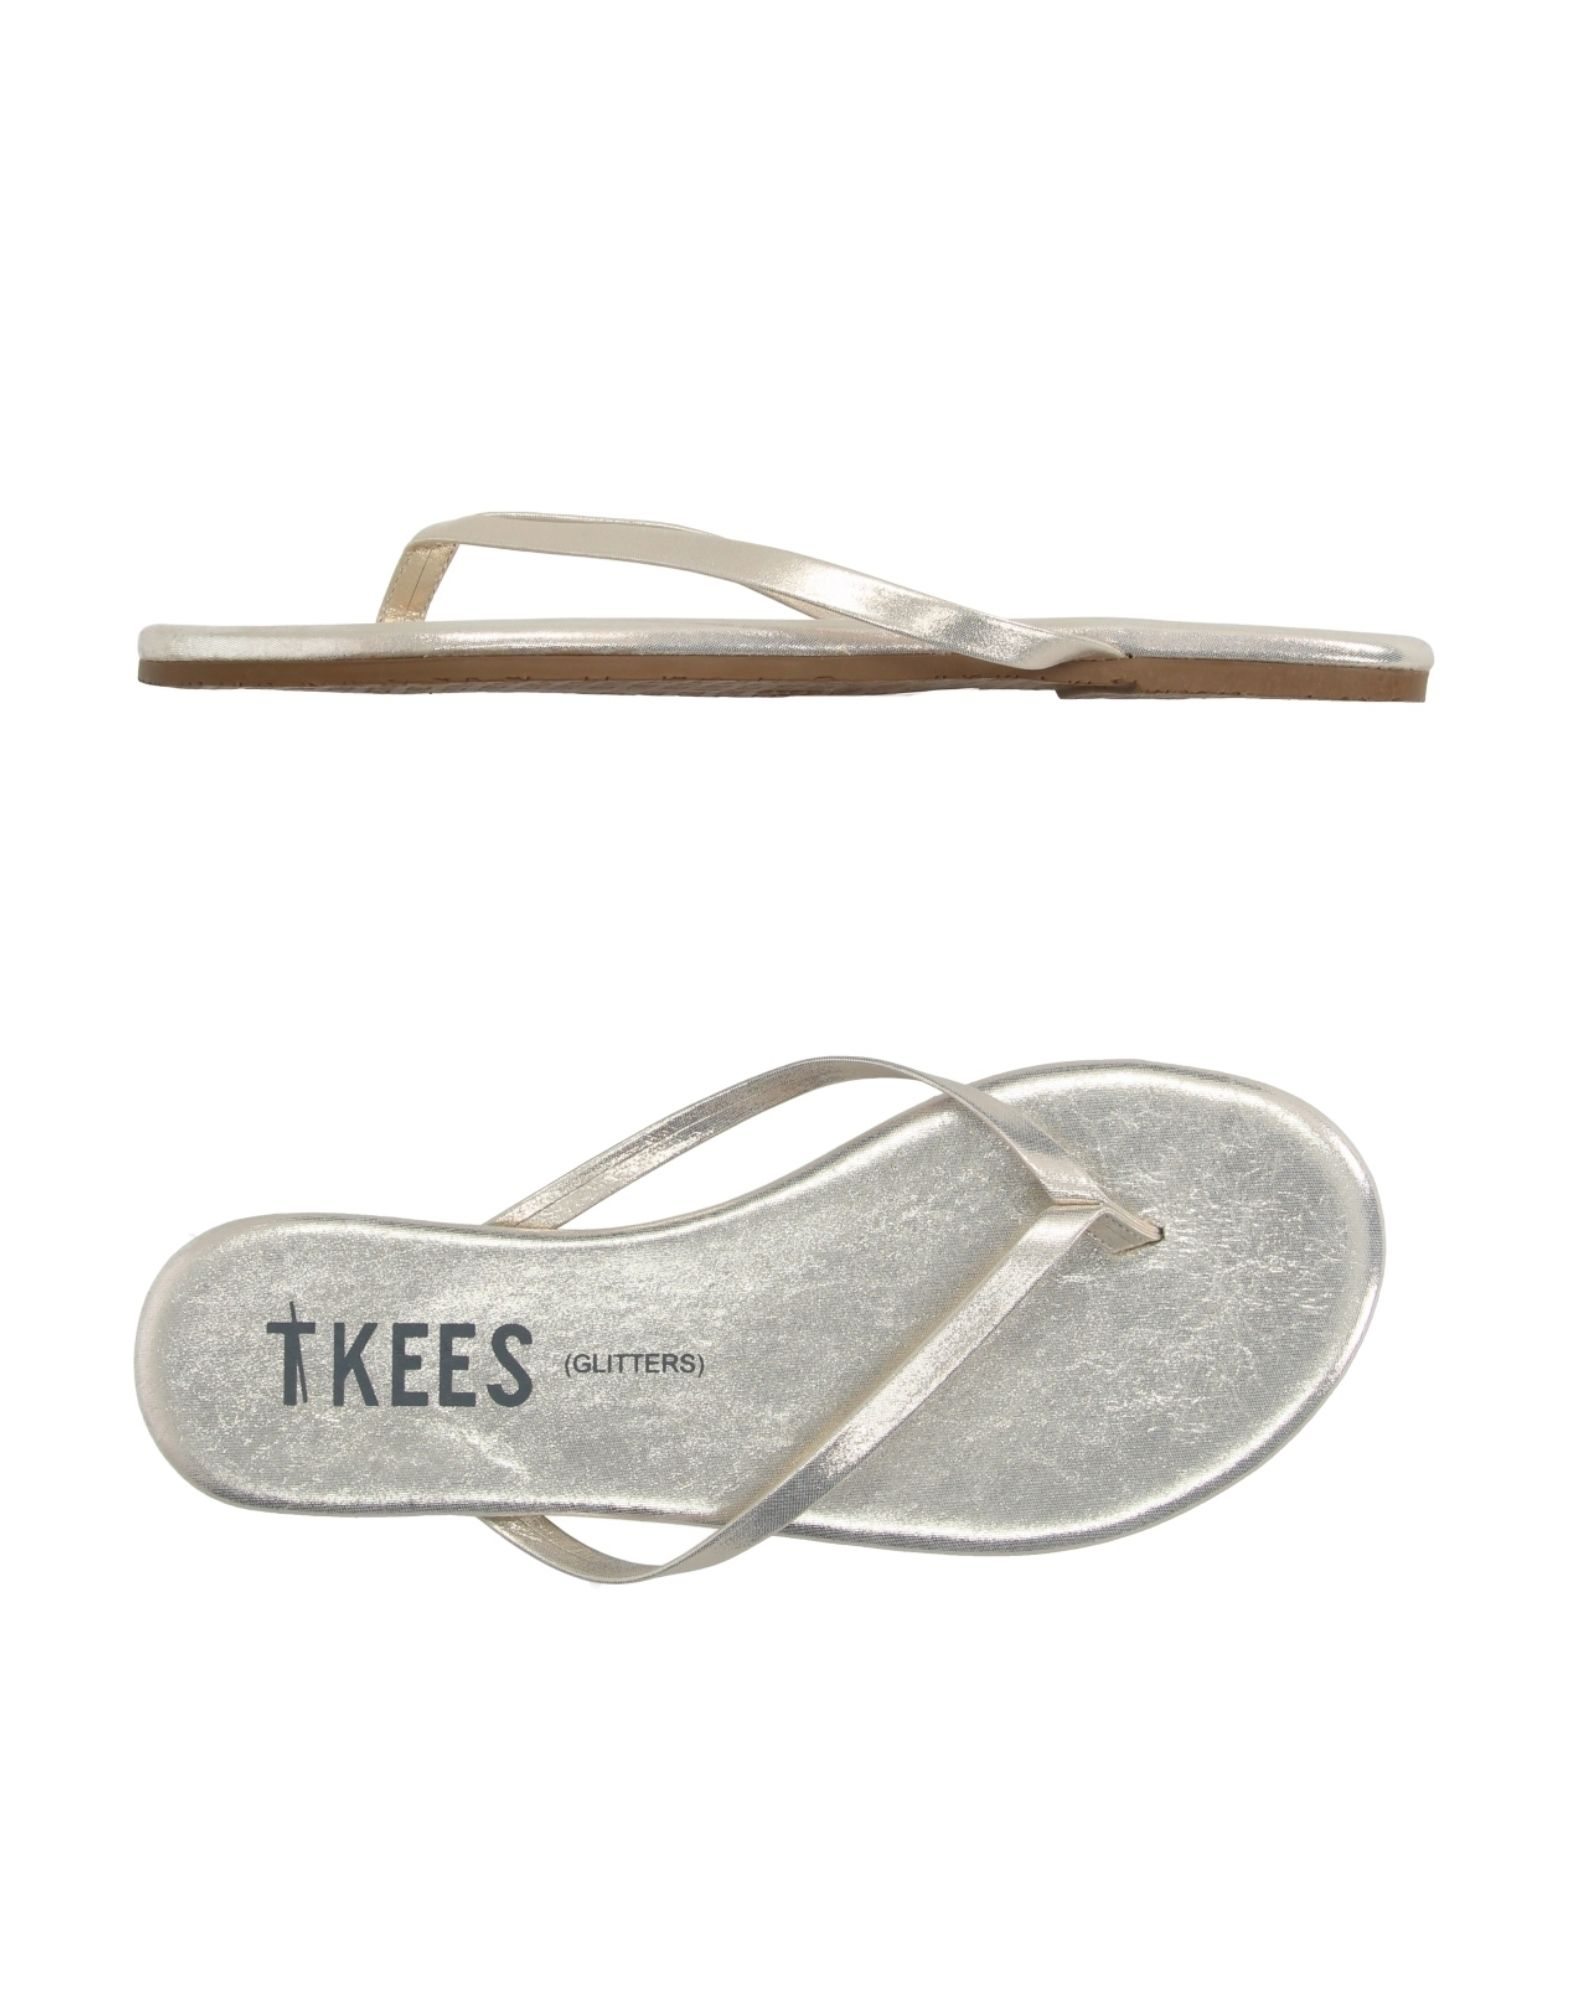 Tkees on Flip Flops - Women Tkees Flip Flops online on Tkees  Australia - 11142566SP 770017